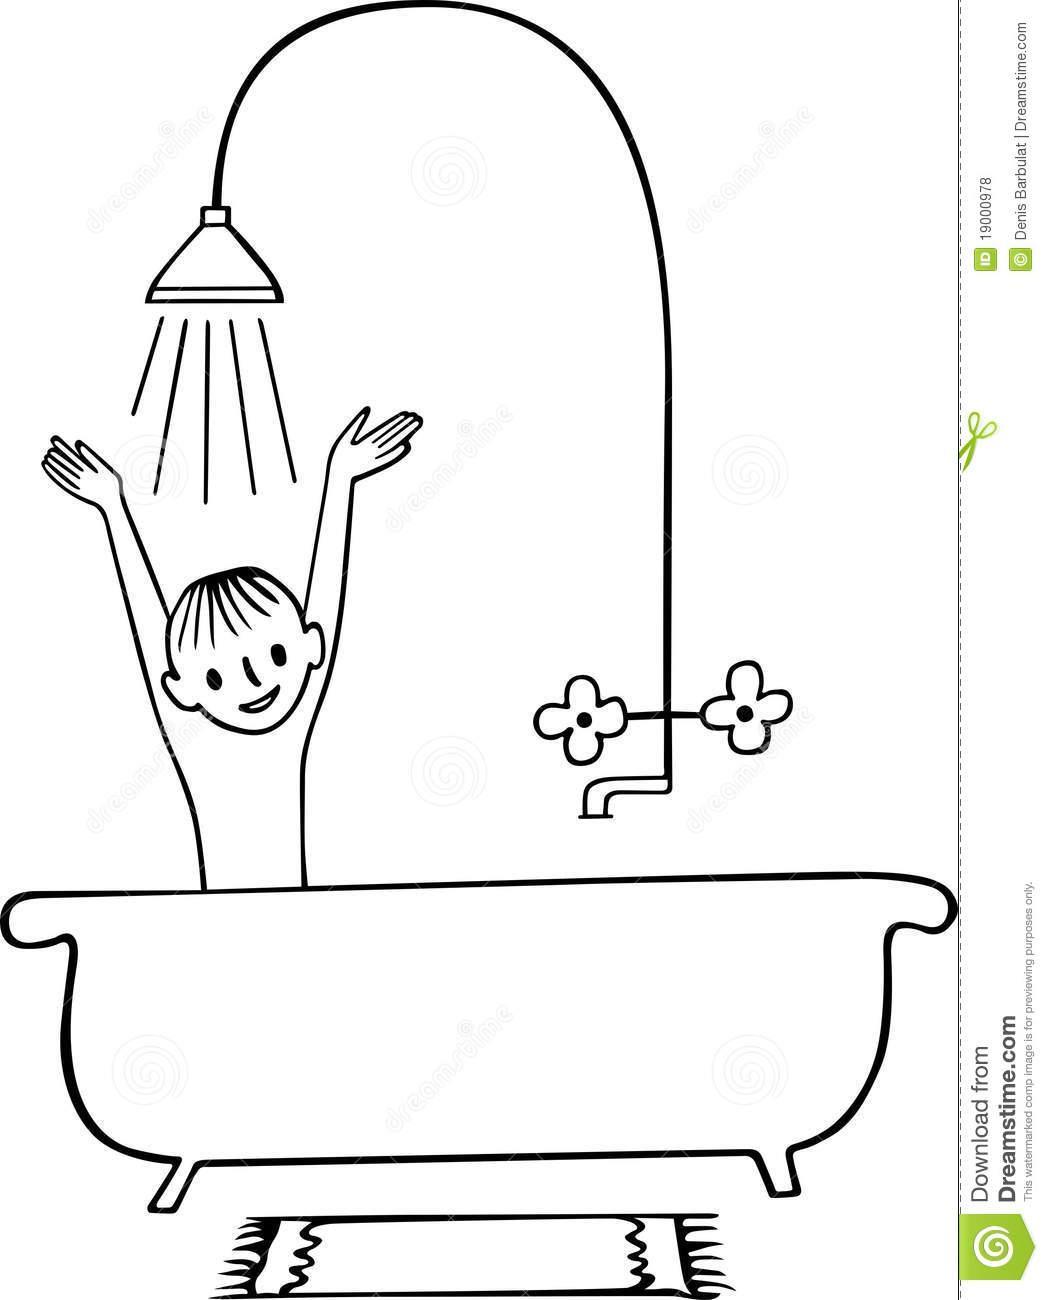 Bathroom clipart kid shower Shower White And #21565